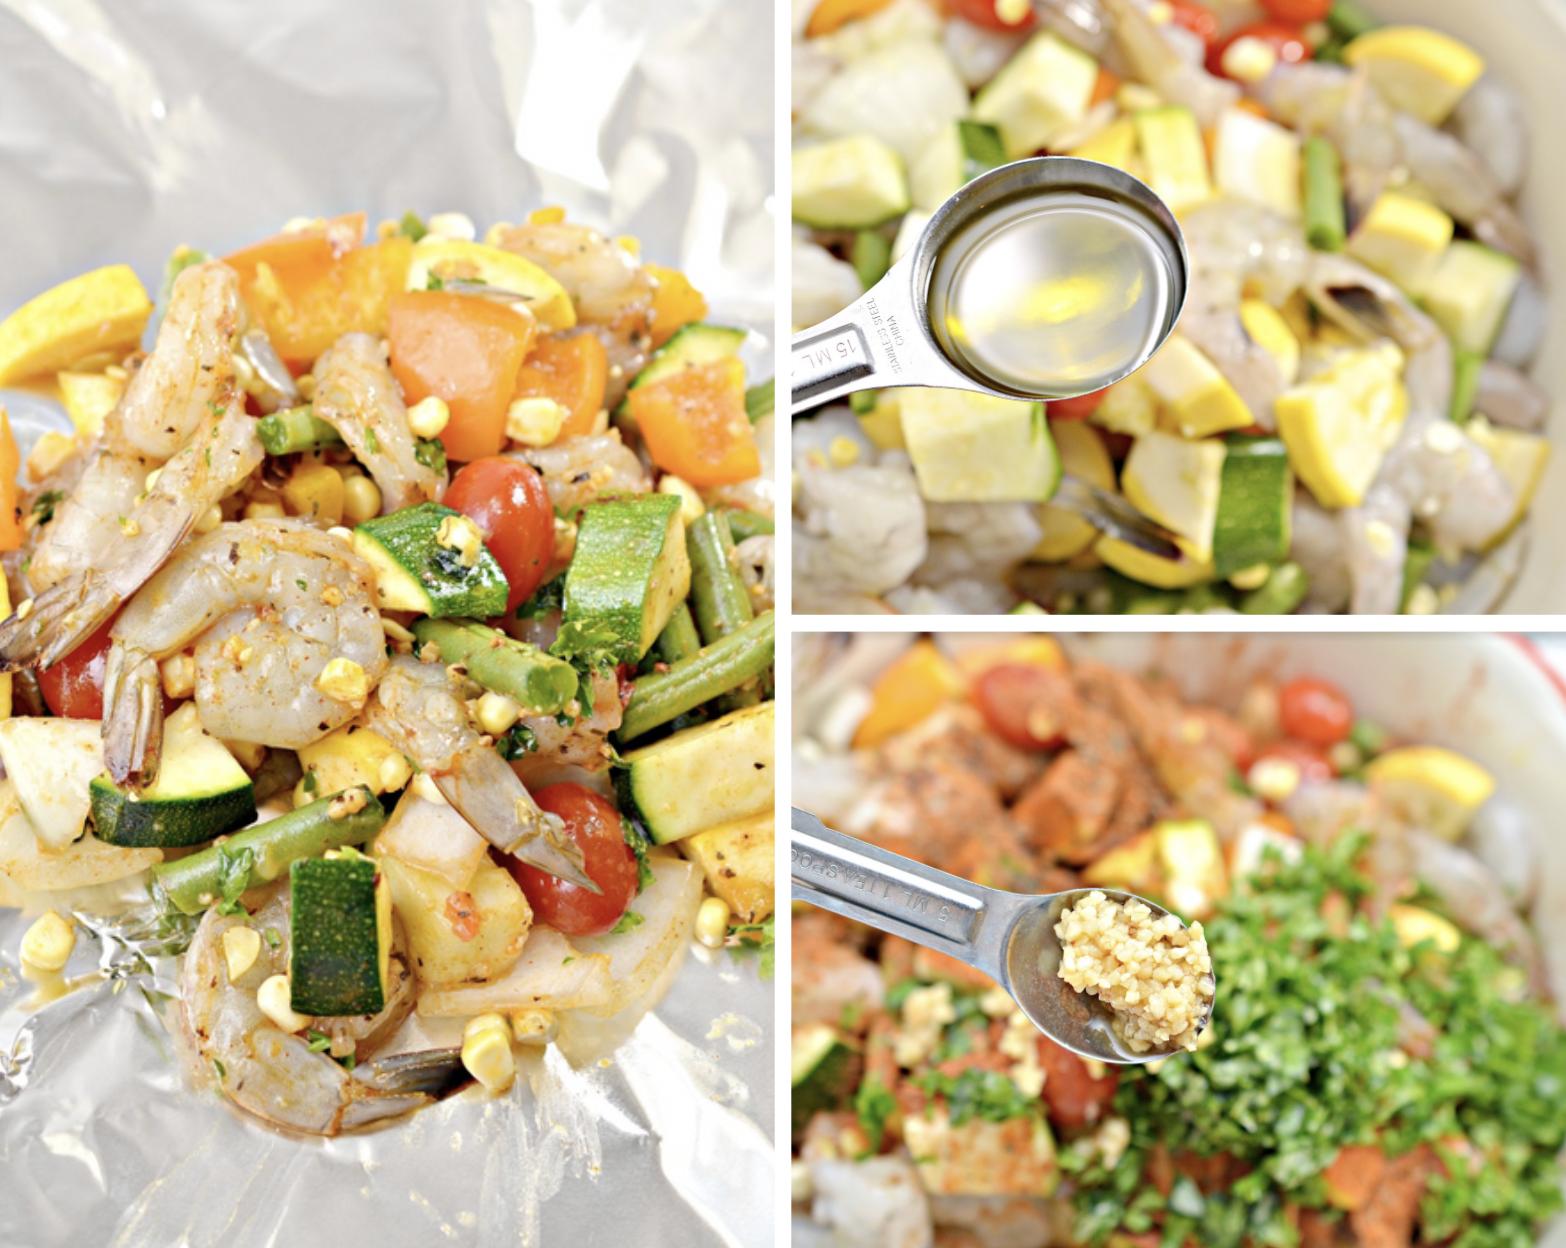 Summer shrimp and veggies foil packs recipe